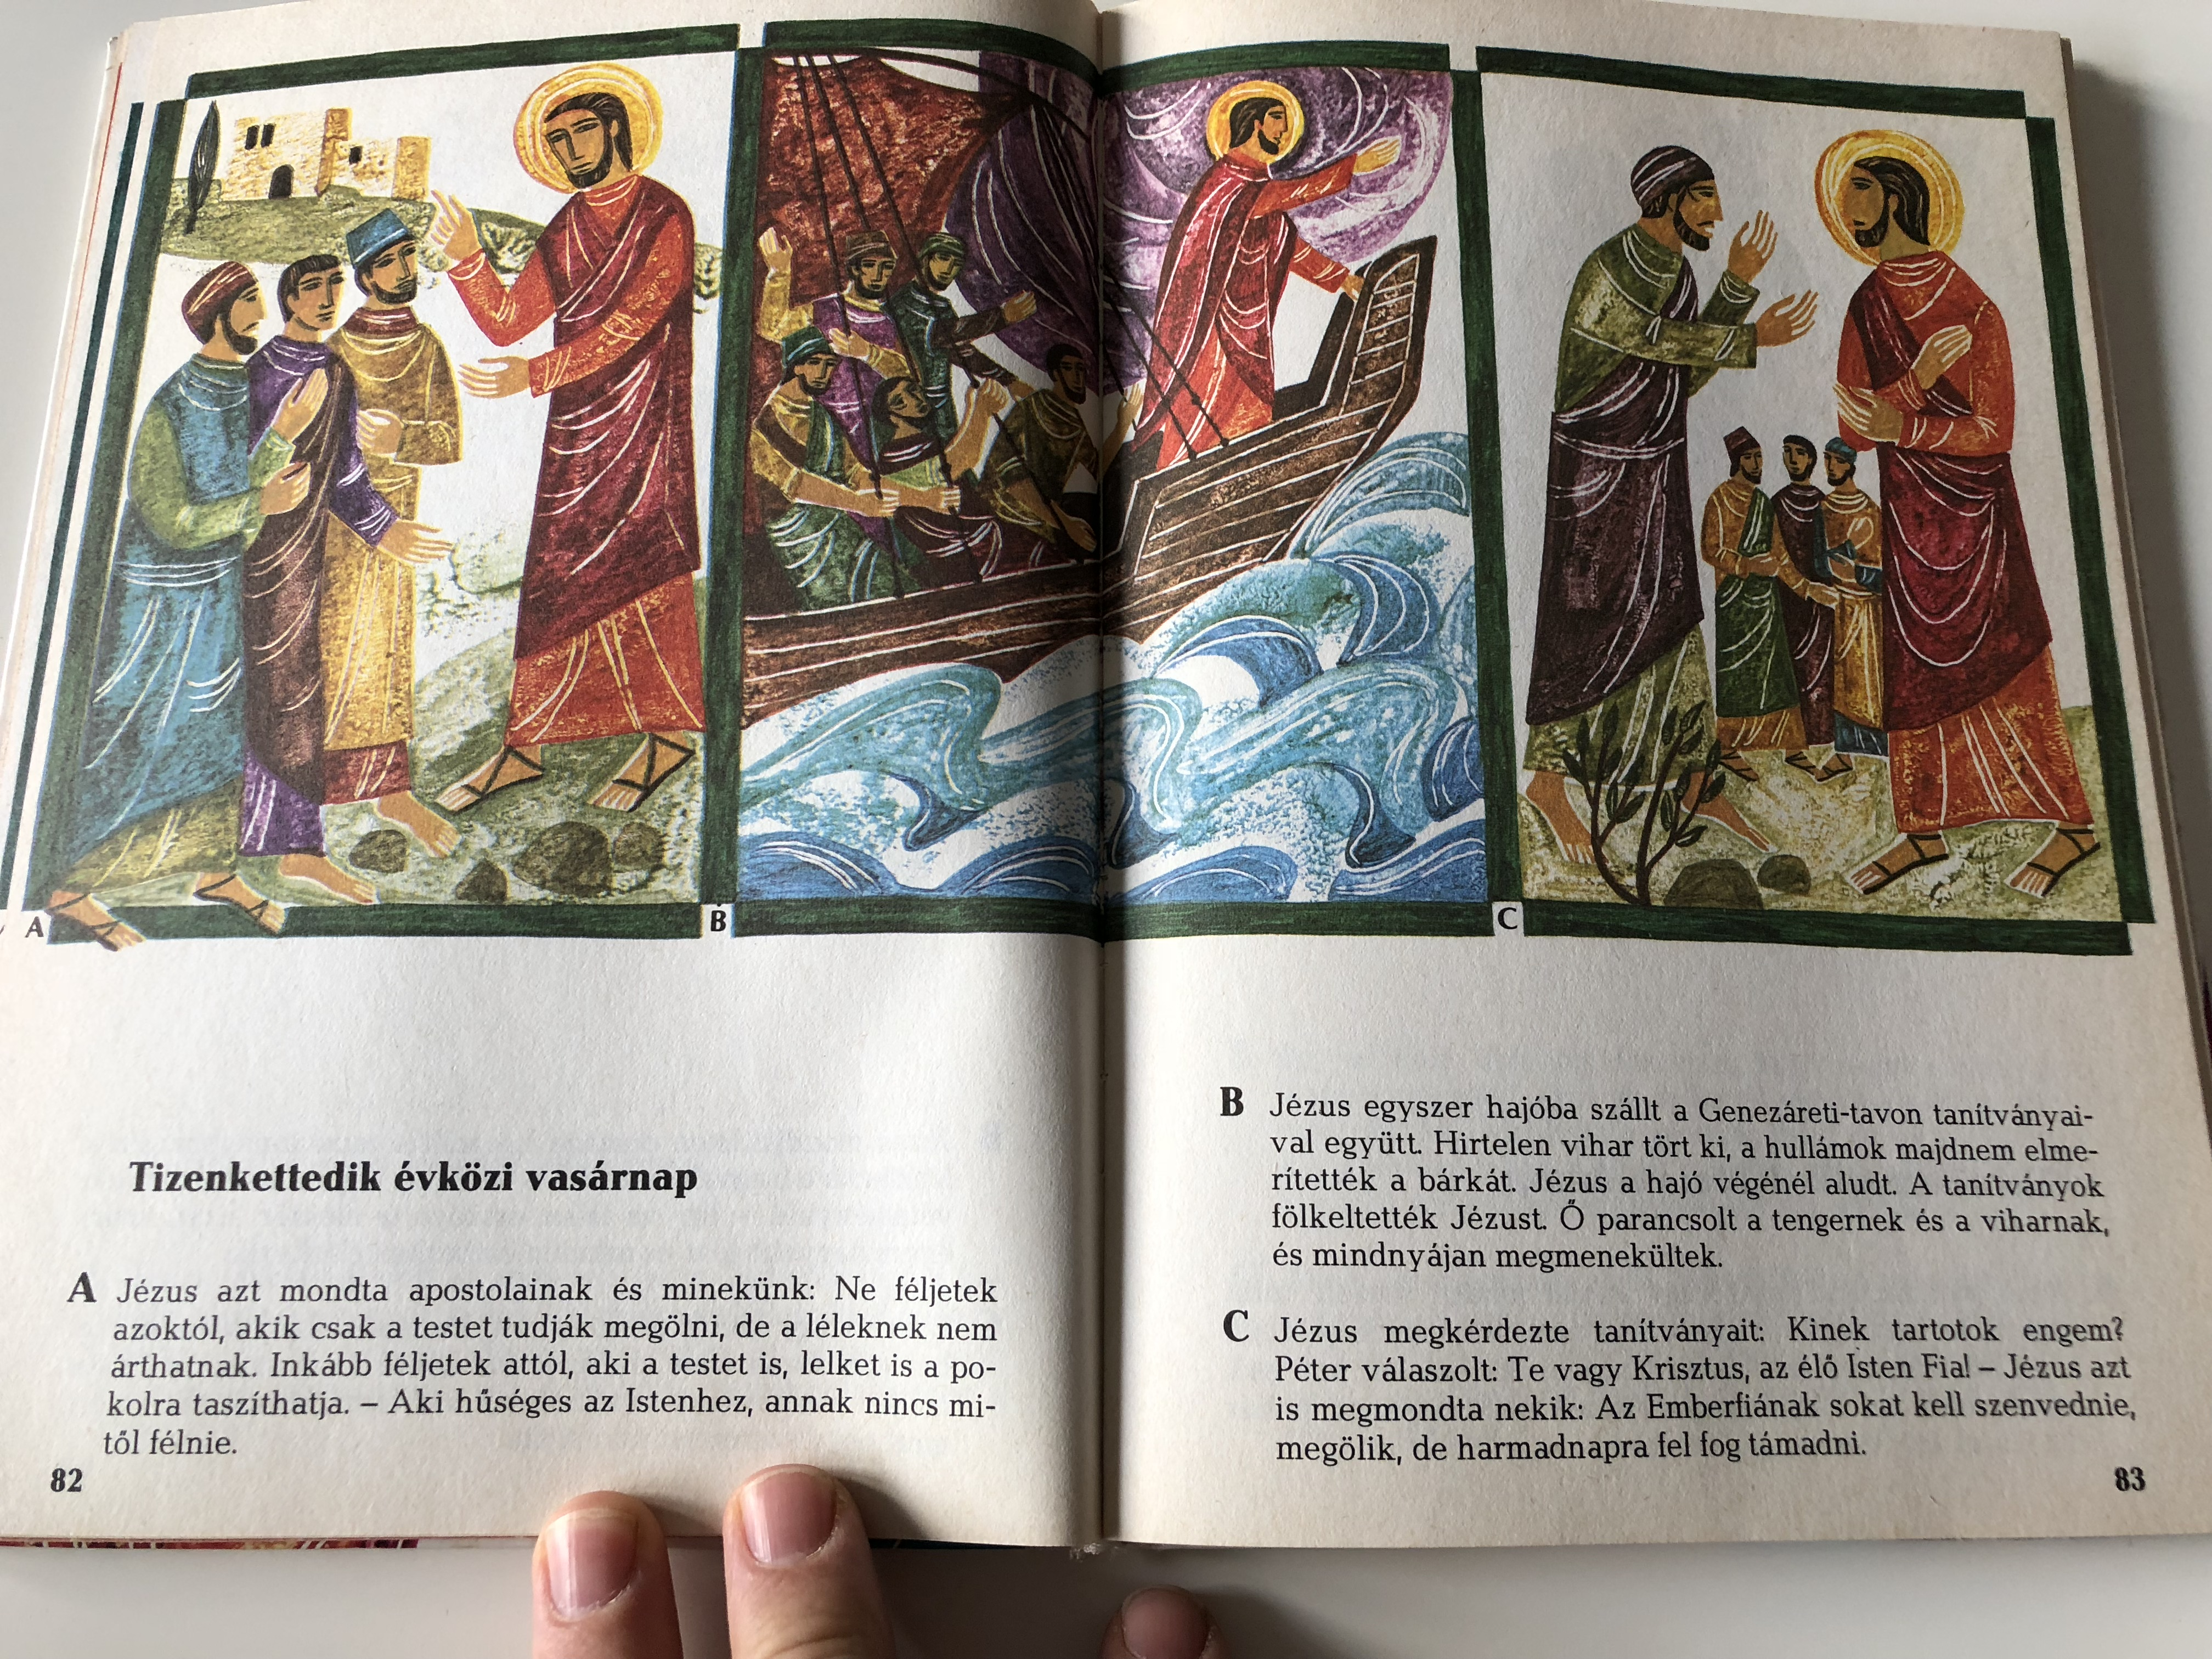 k-pes-evang-lium-by-k.-kammelberger-az-egyh-zi-v-nnepeire-s-vas-rnapjaira-hungarian-translation-of-bilderbibel-zum-neuen-kirchenjahr-illustration-h.-bledl-szent-istv-n-t-rsulat-14-.jpg